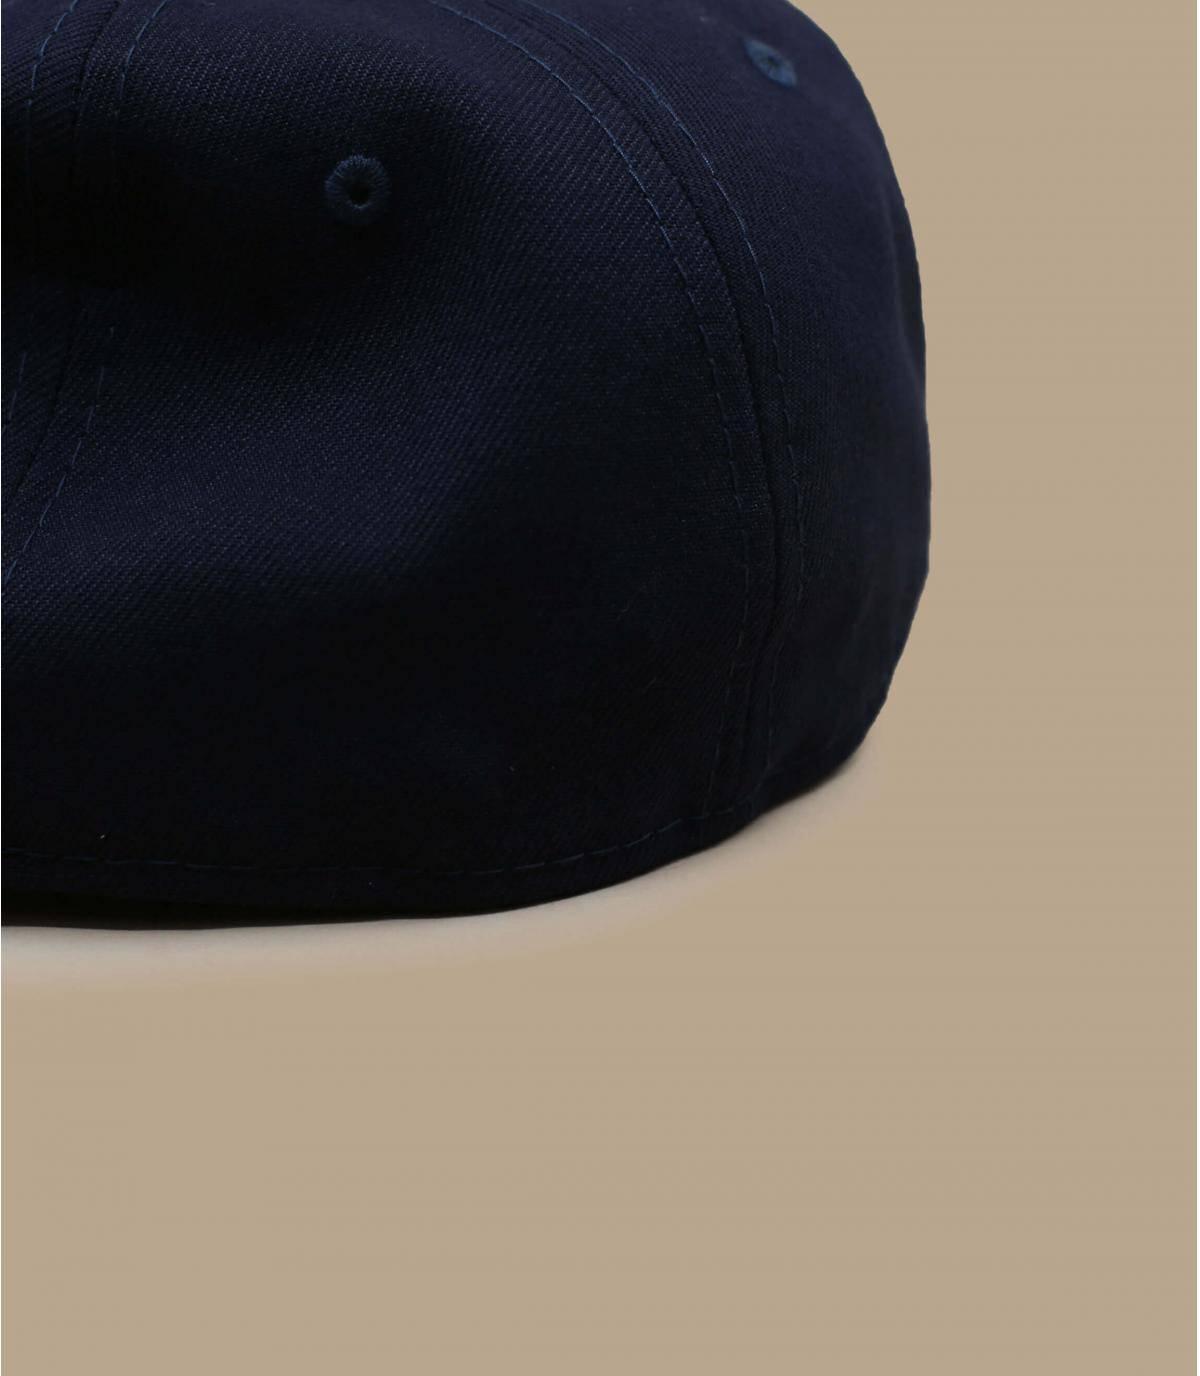 Détails MLB AC Perf 5950 Atlanta Braves - image 3